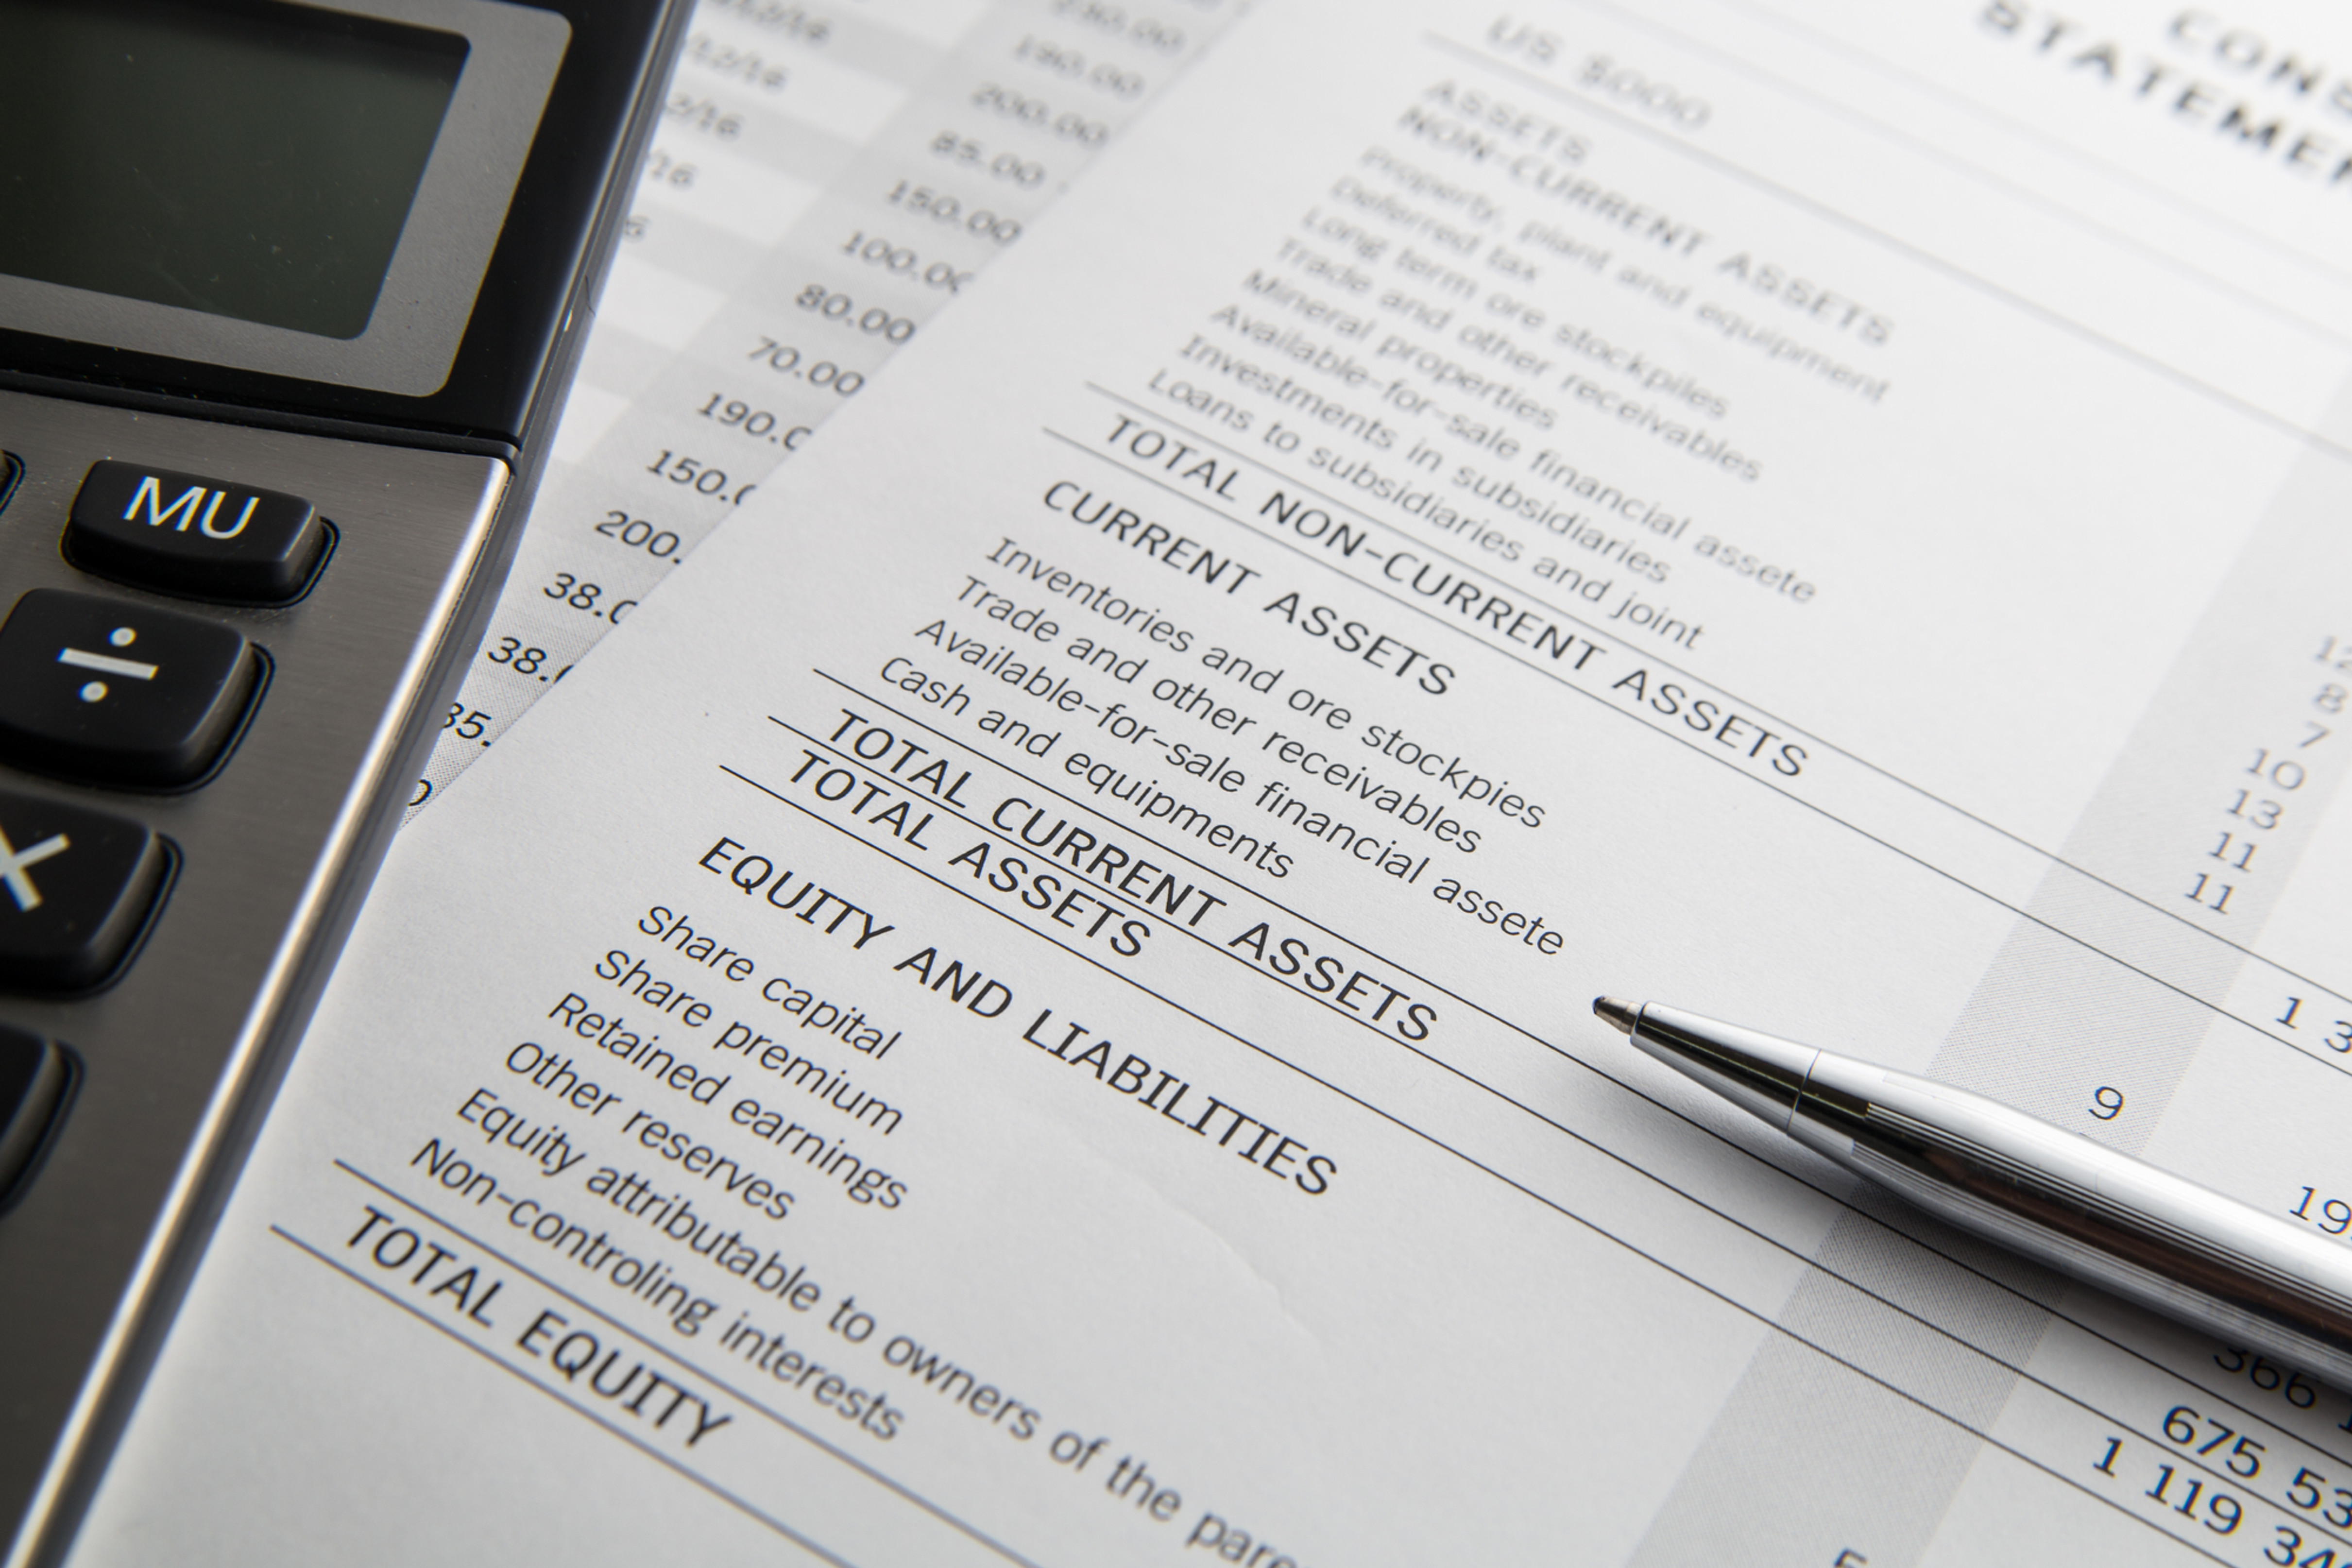 Company Financials & Tax Return